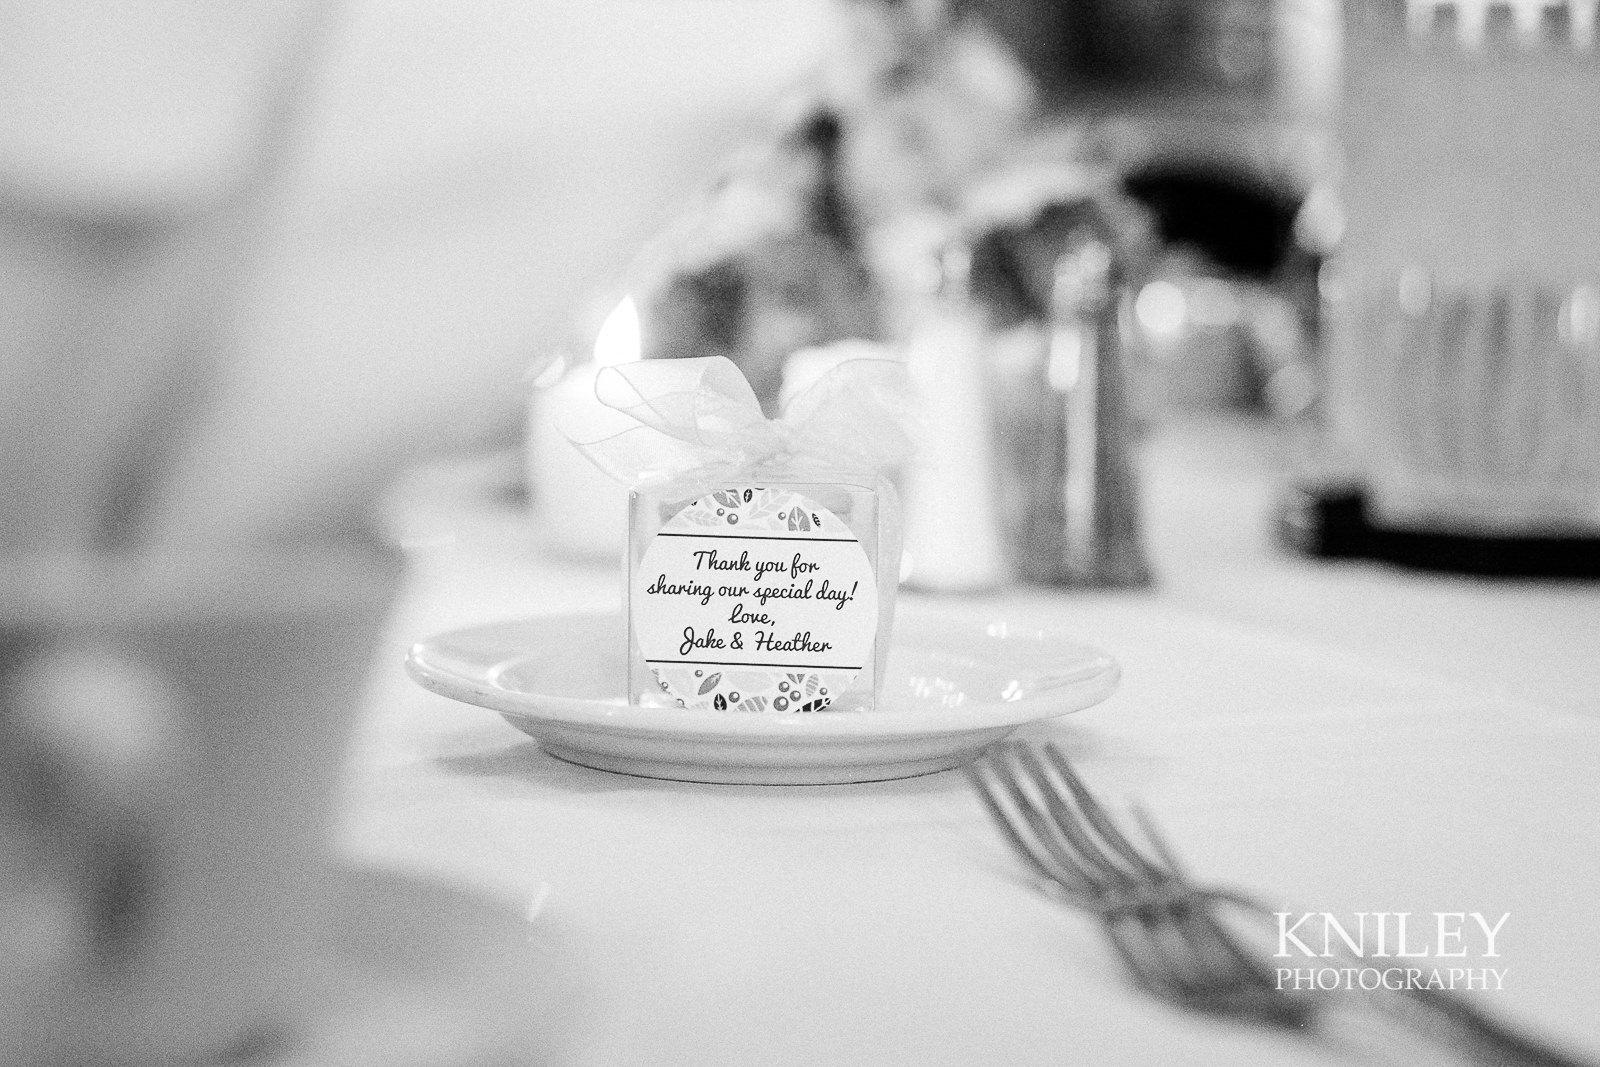 082 - Buffalo NY wedding pictures - Sean Patrick Restaurant Wedding Reception - Getzville - IMG_8338.jpg